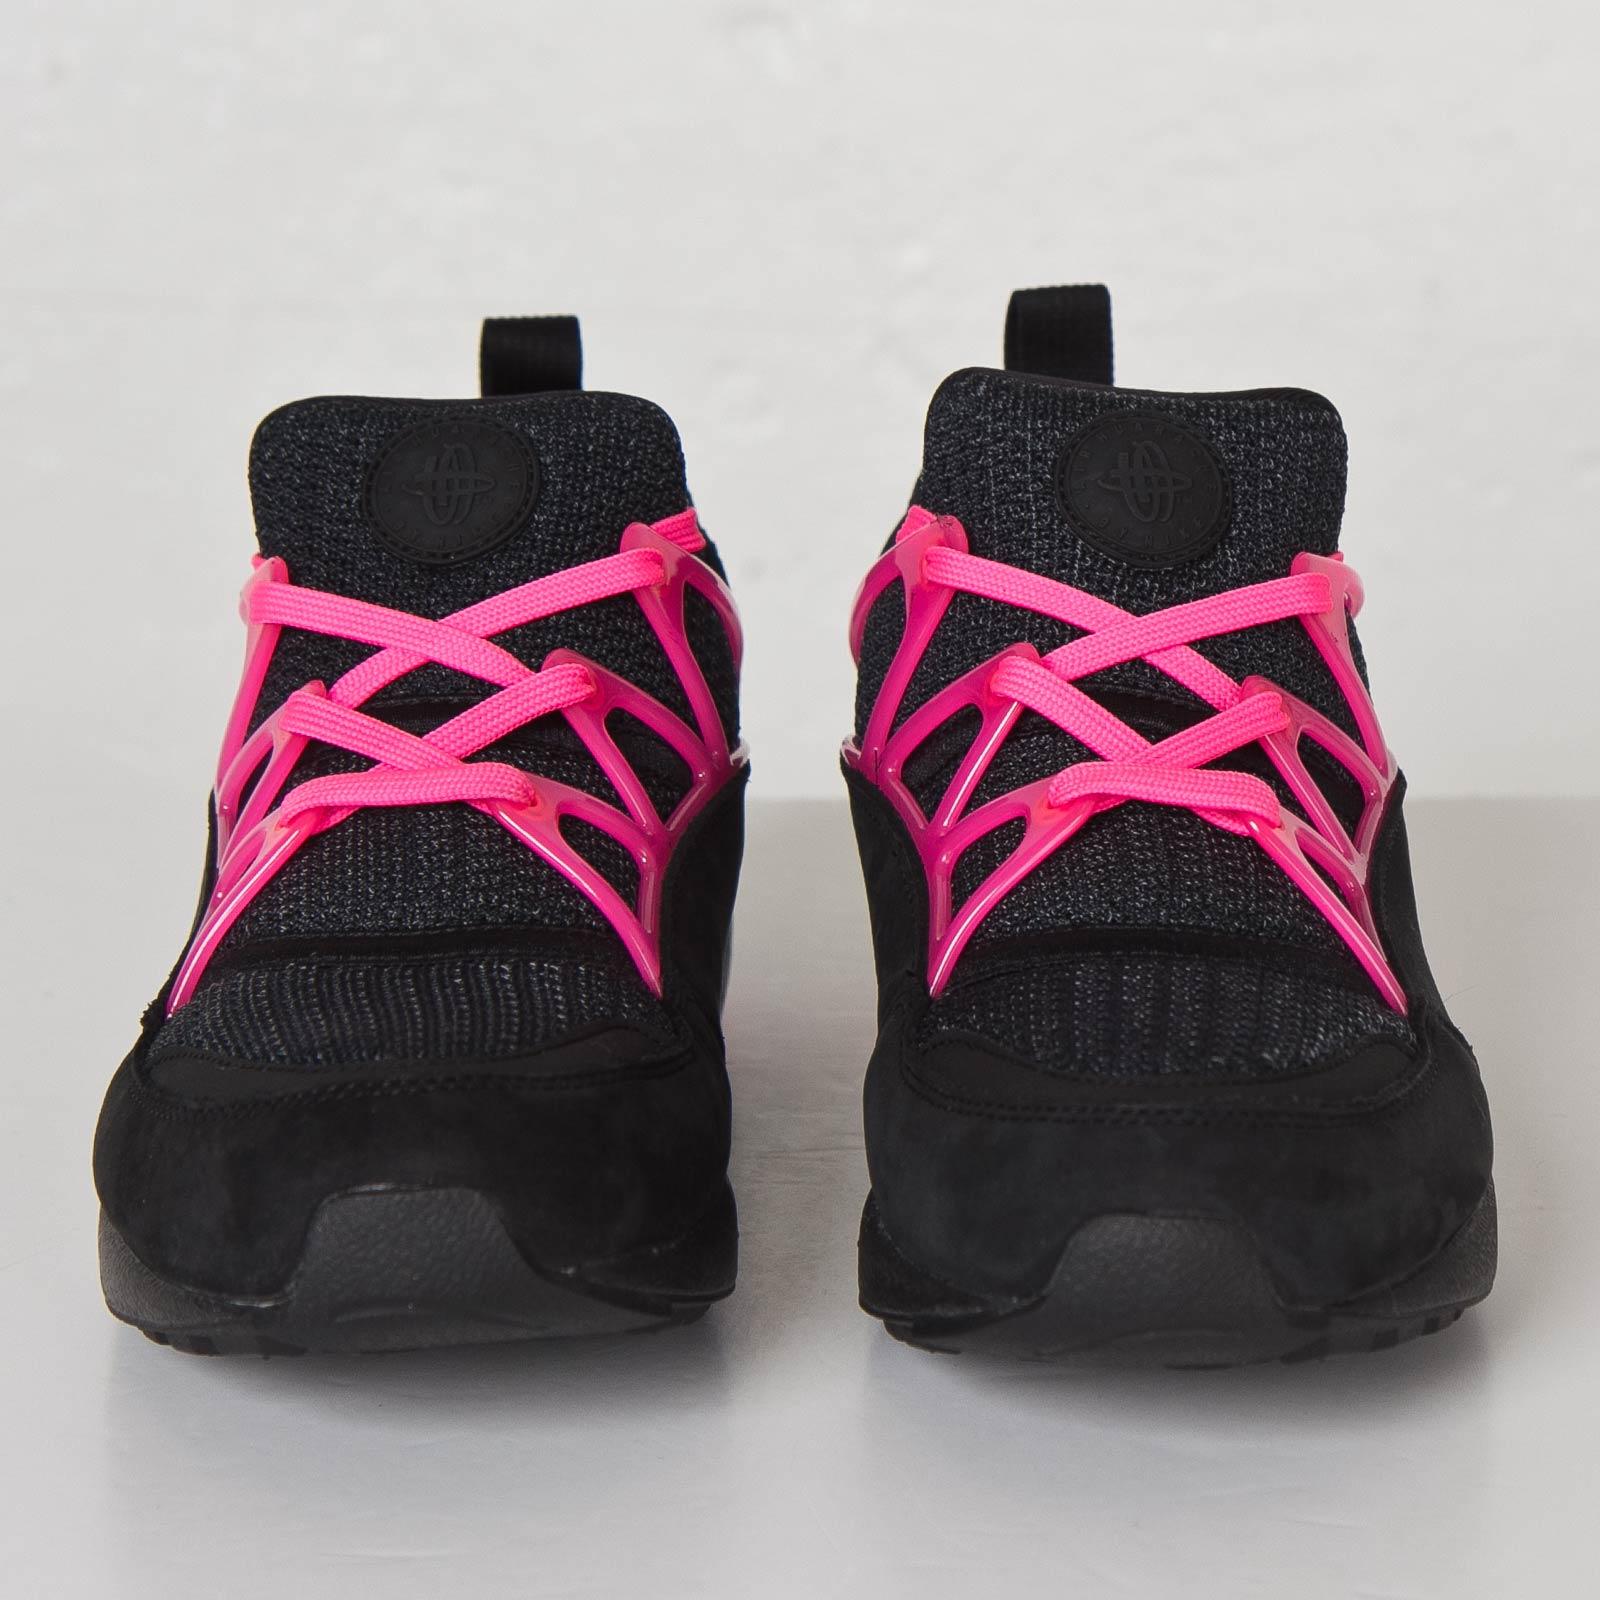 112fc0e871178 Nike Air Huarache Light FC - 749955-002 - Sneakersnstuff